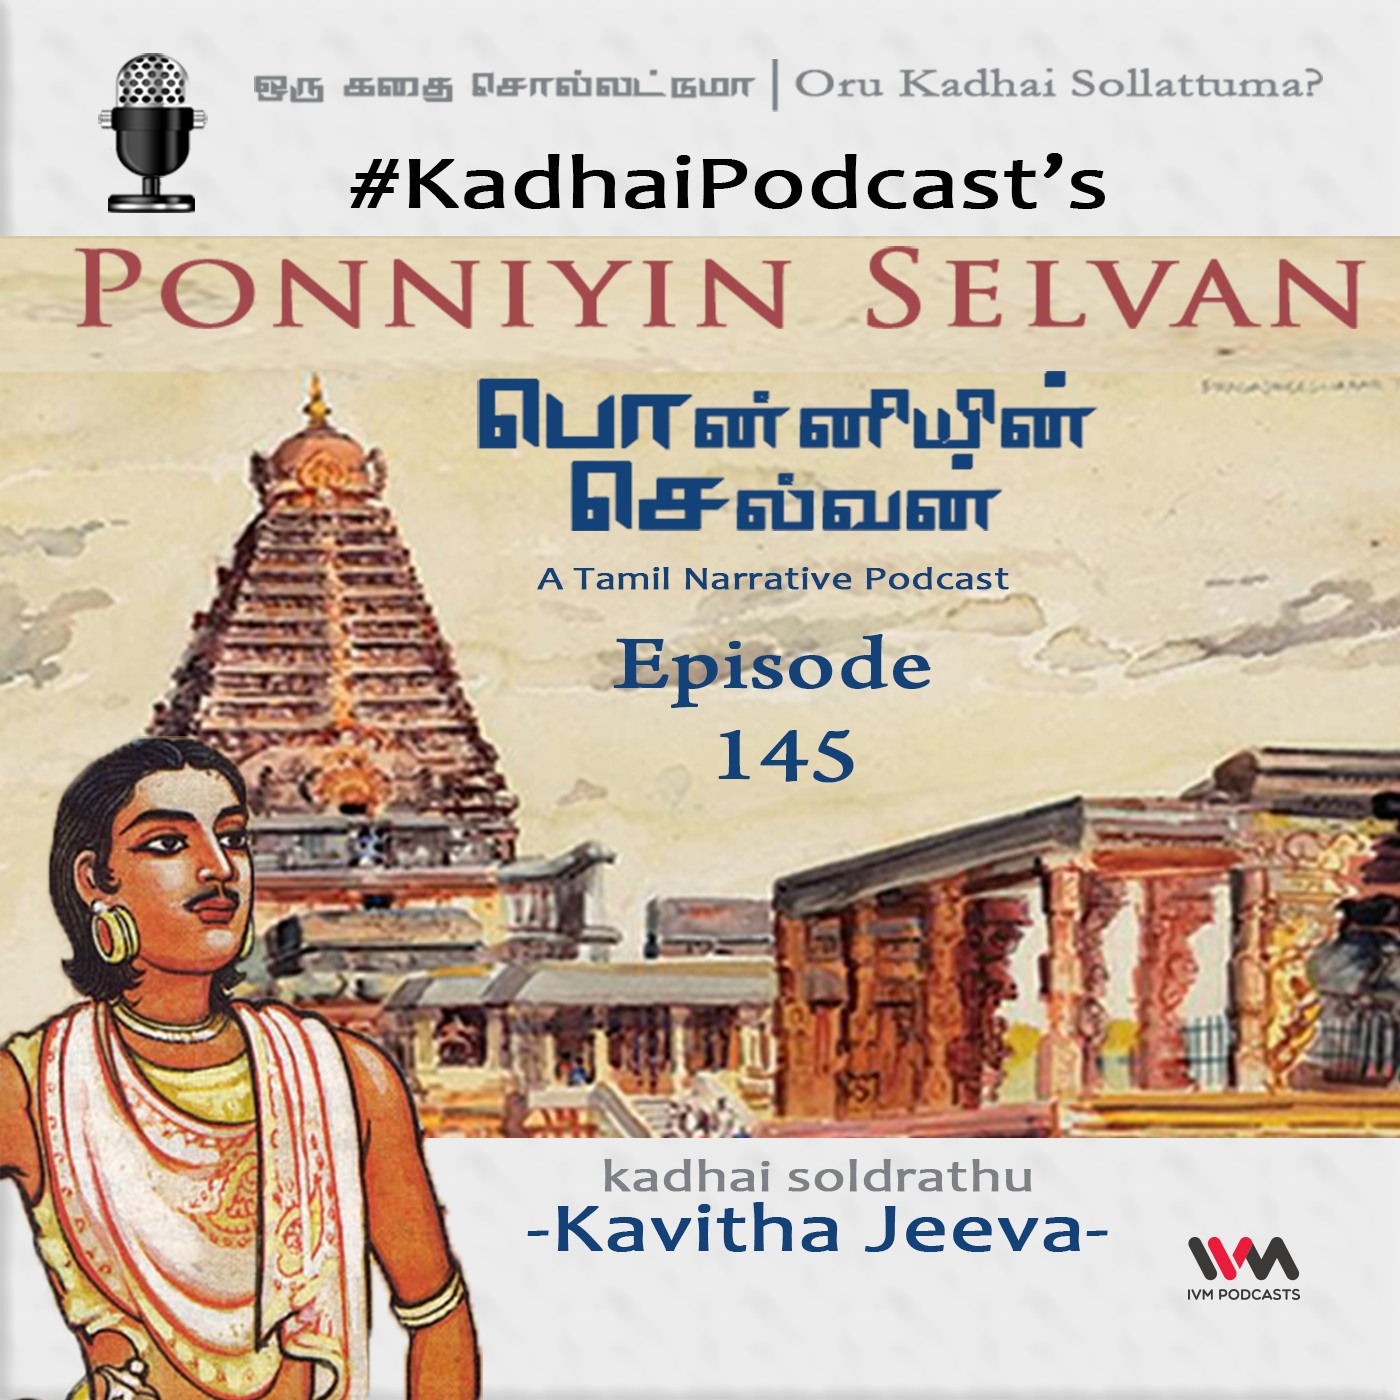 KadhaiPodcast's Ponniyin Selvan - Episode # 145